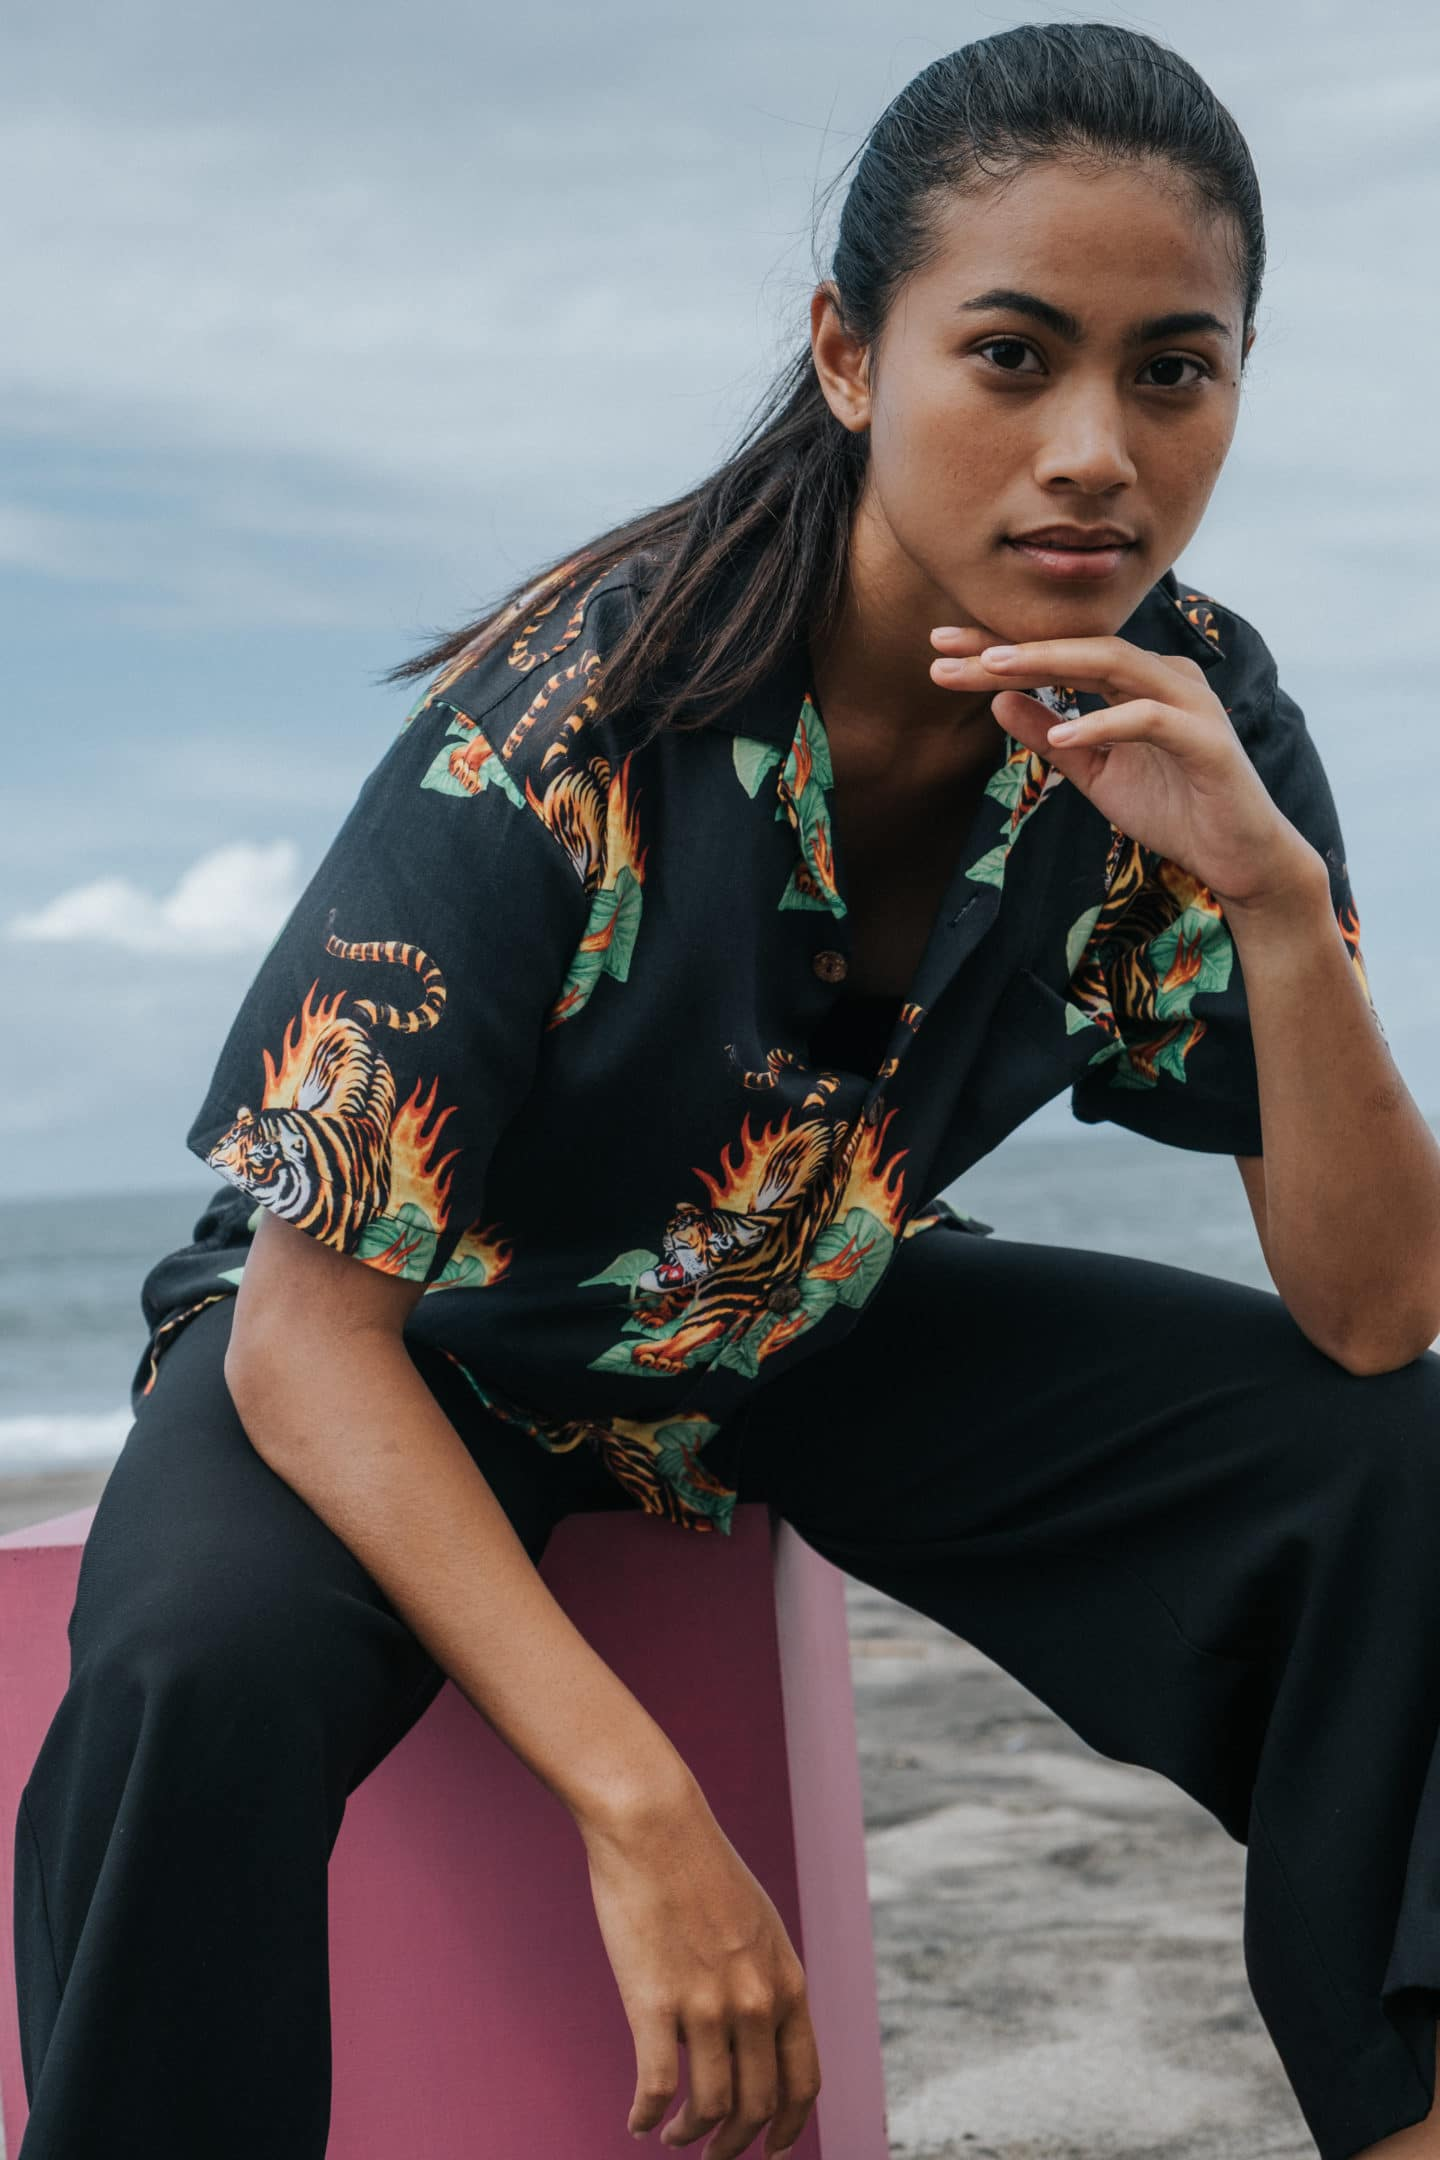 Potato Head Bali Beach Hawaiian shirt Spring/Summer 2019 collection girl